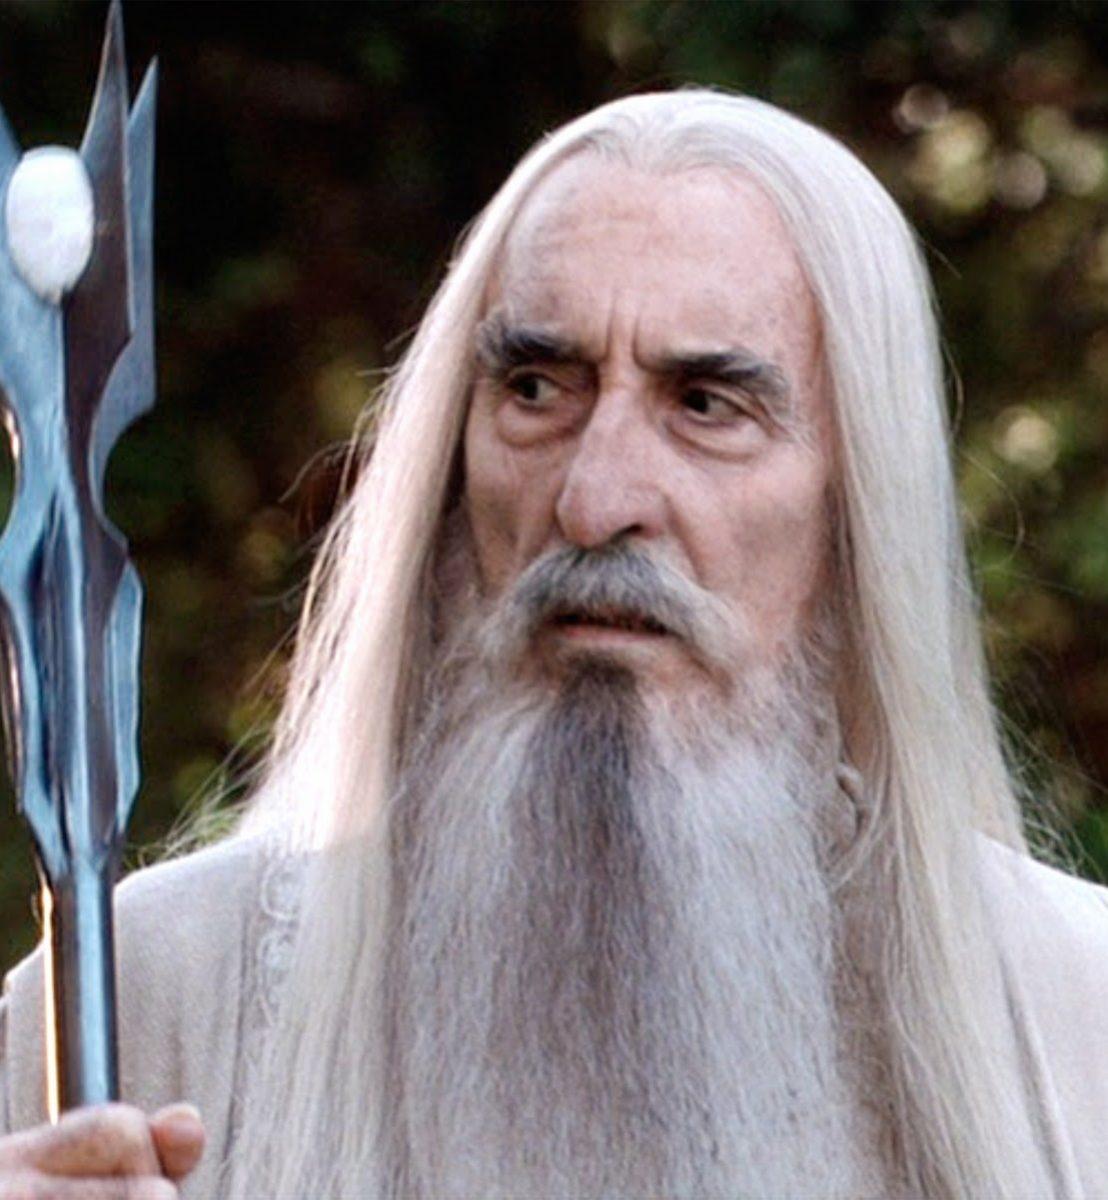 Saruman r1